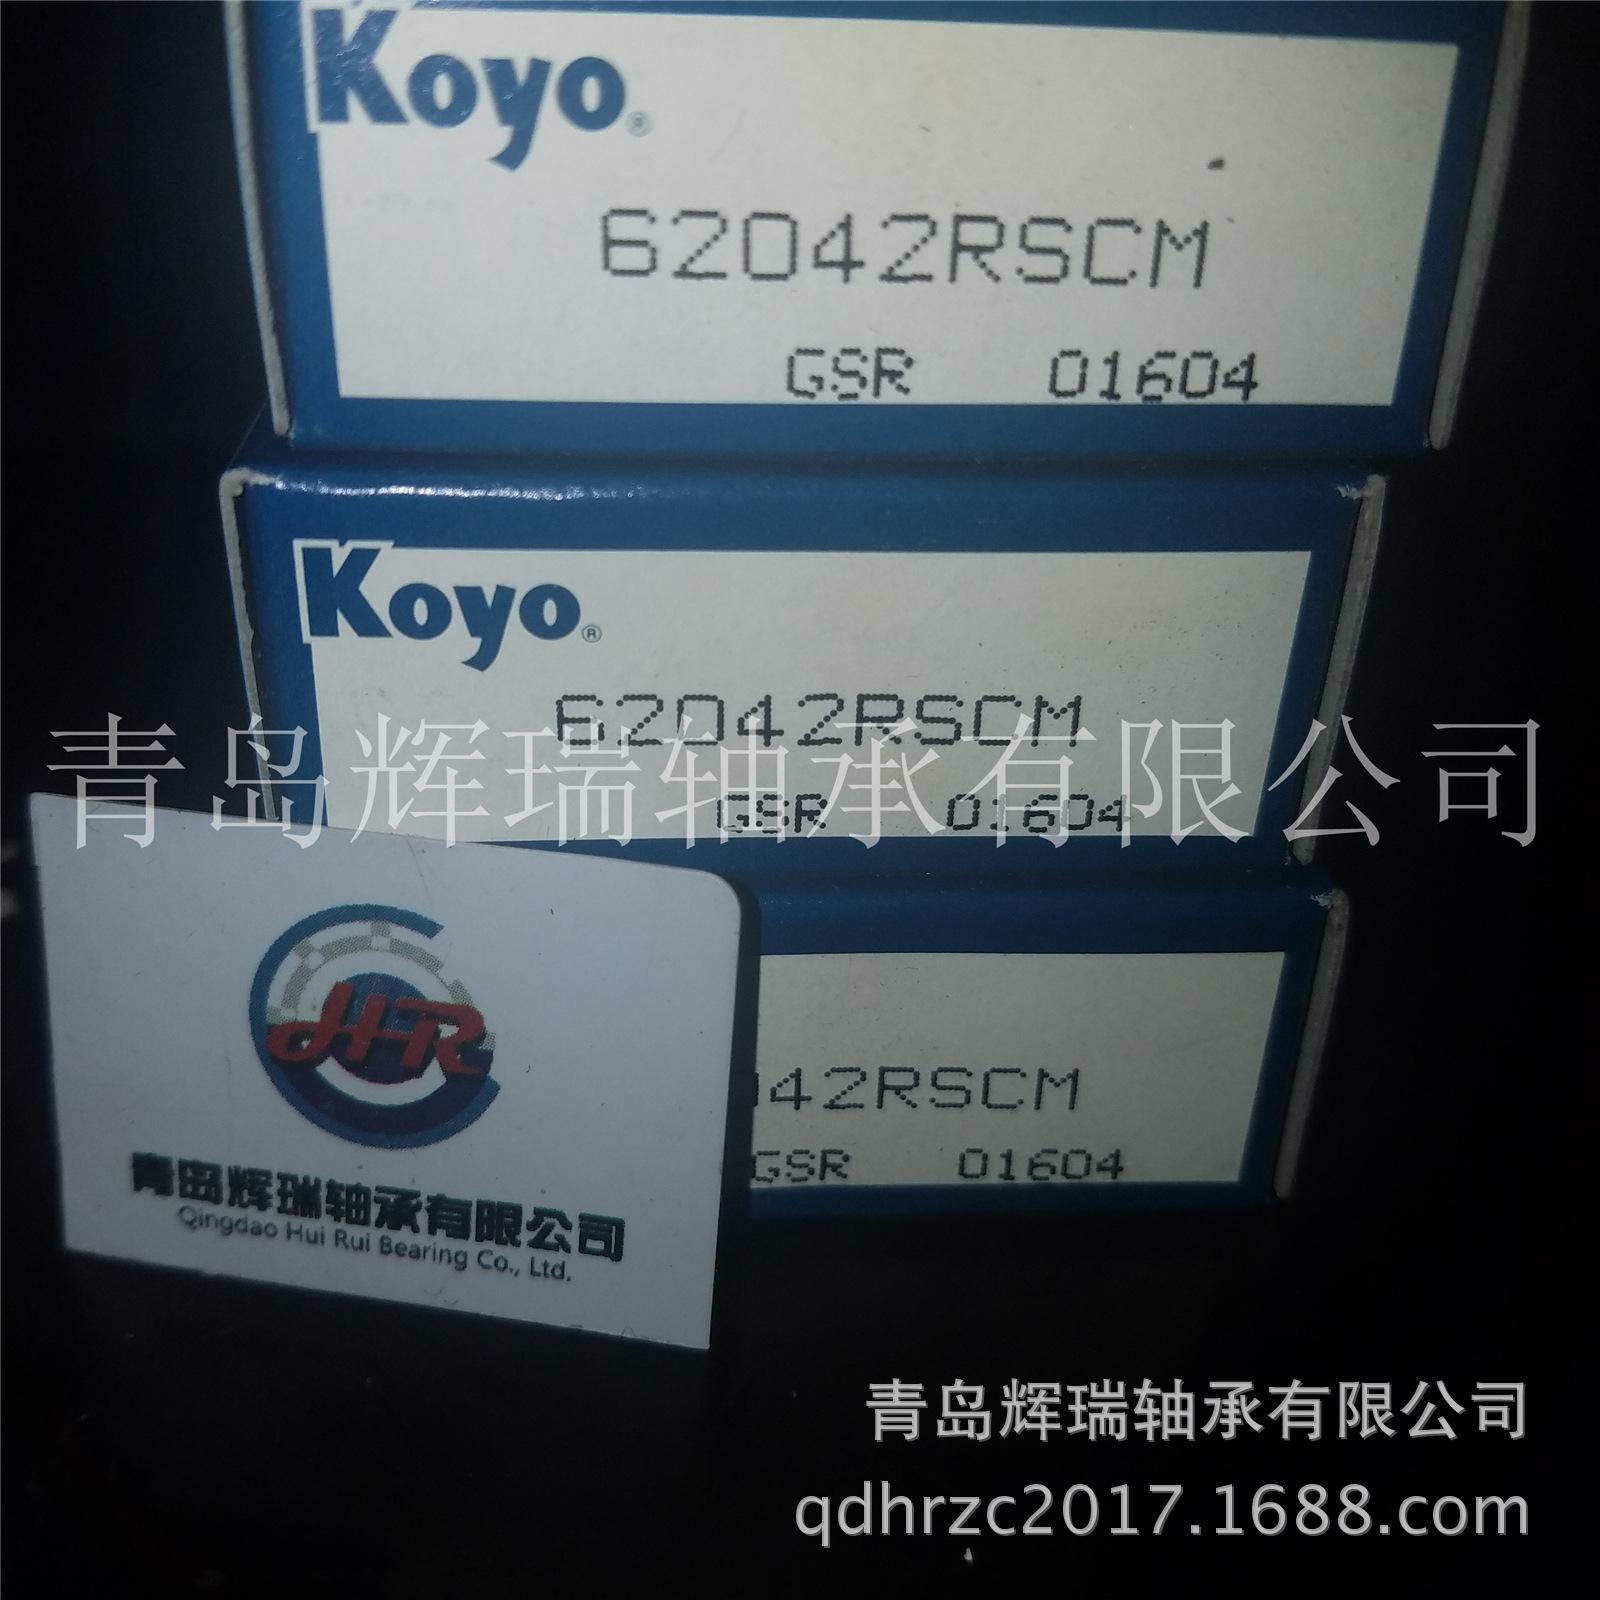 KOYO轴承6204-2RSCM-6204RS